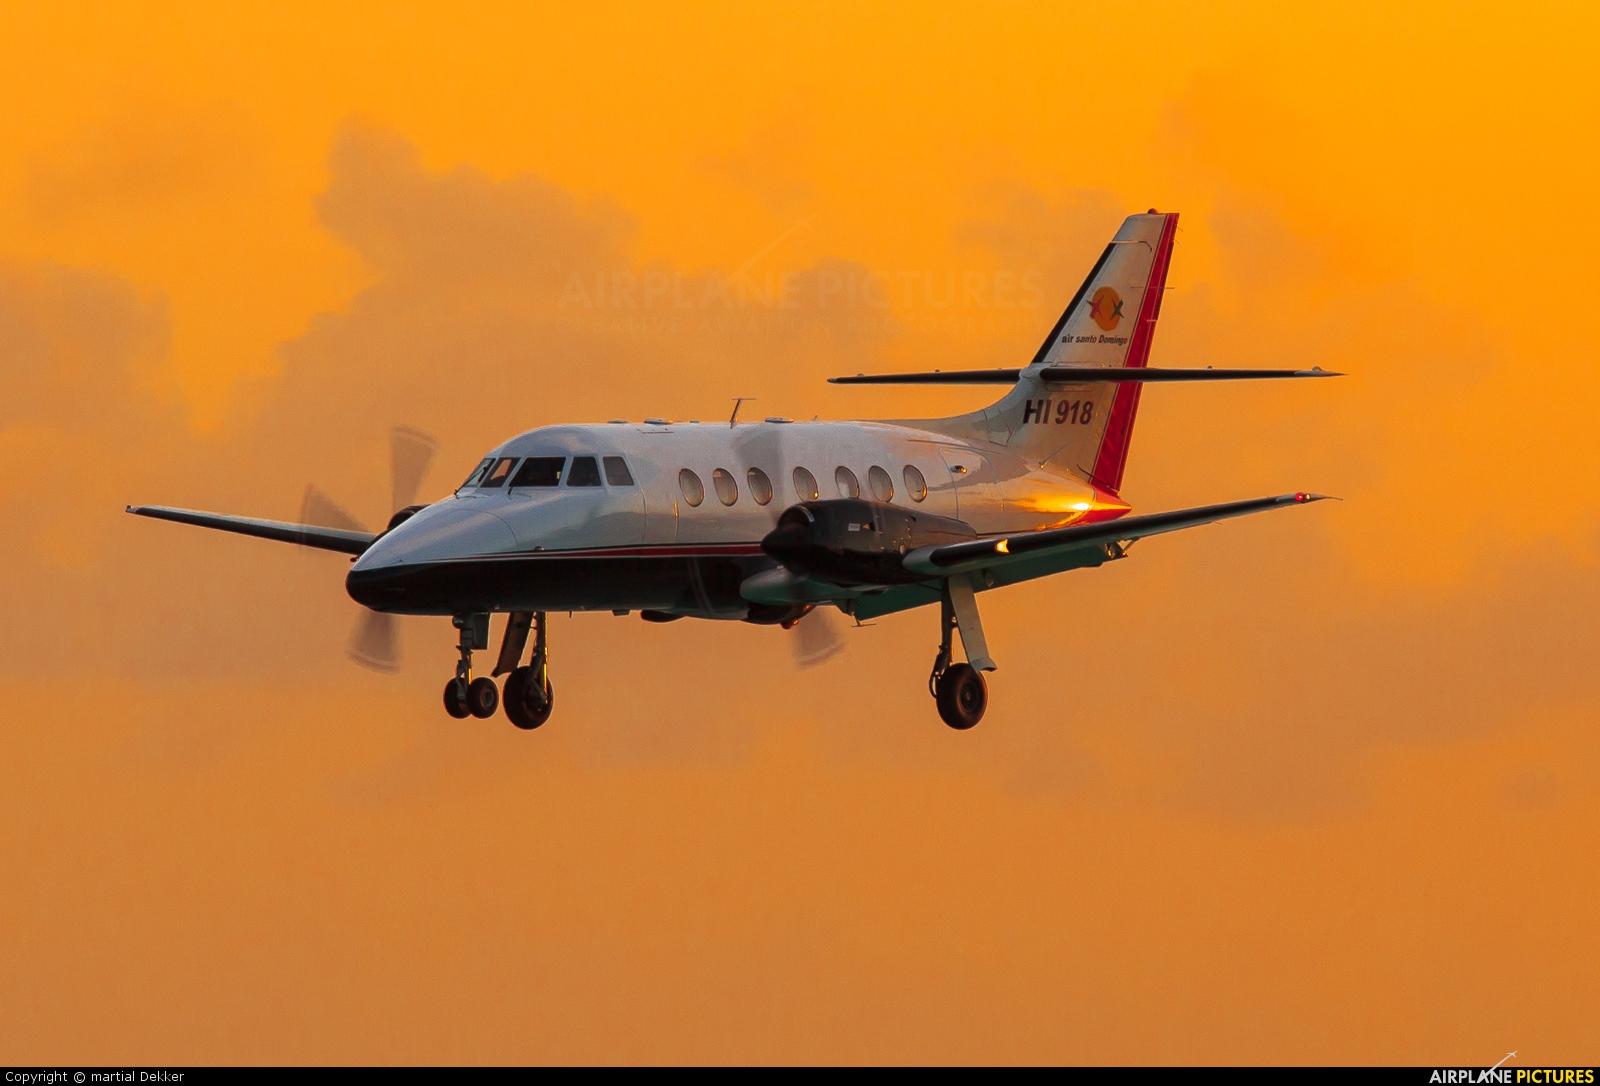 Air Santo Domingo HI-918 aircraft at Sint Maarten - Princess Juliana Intl